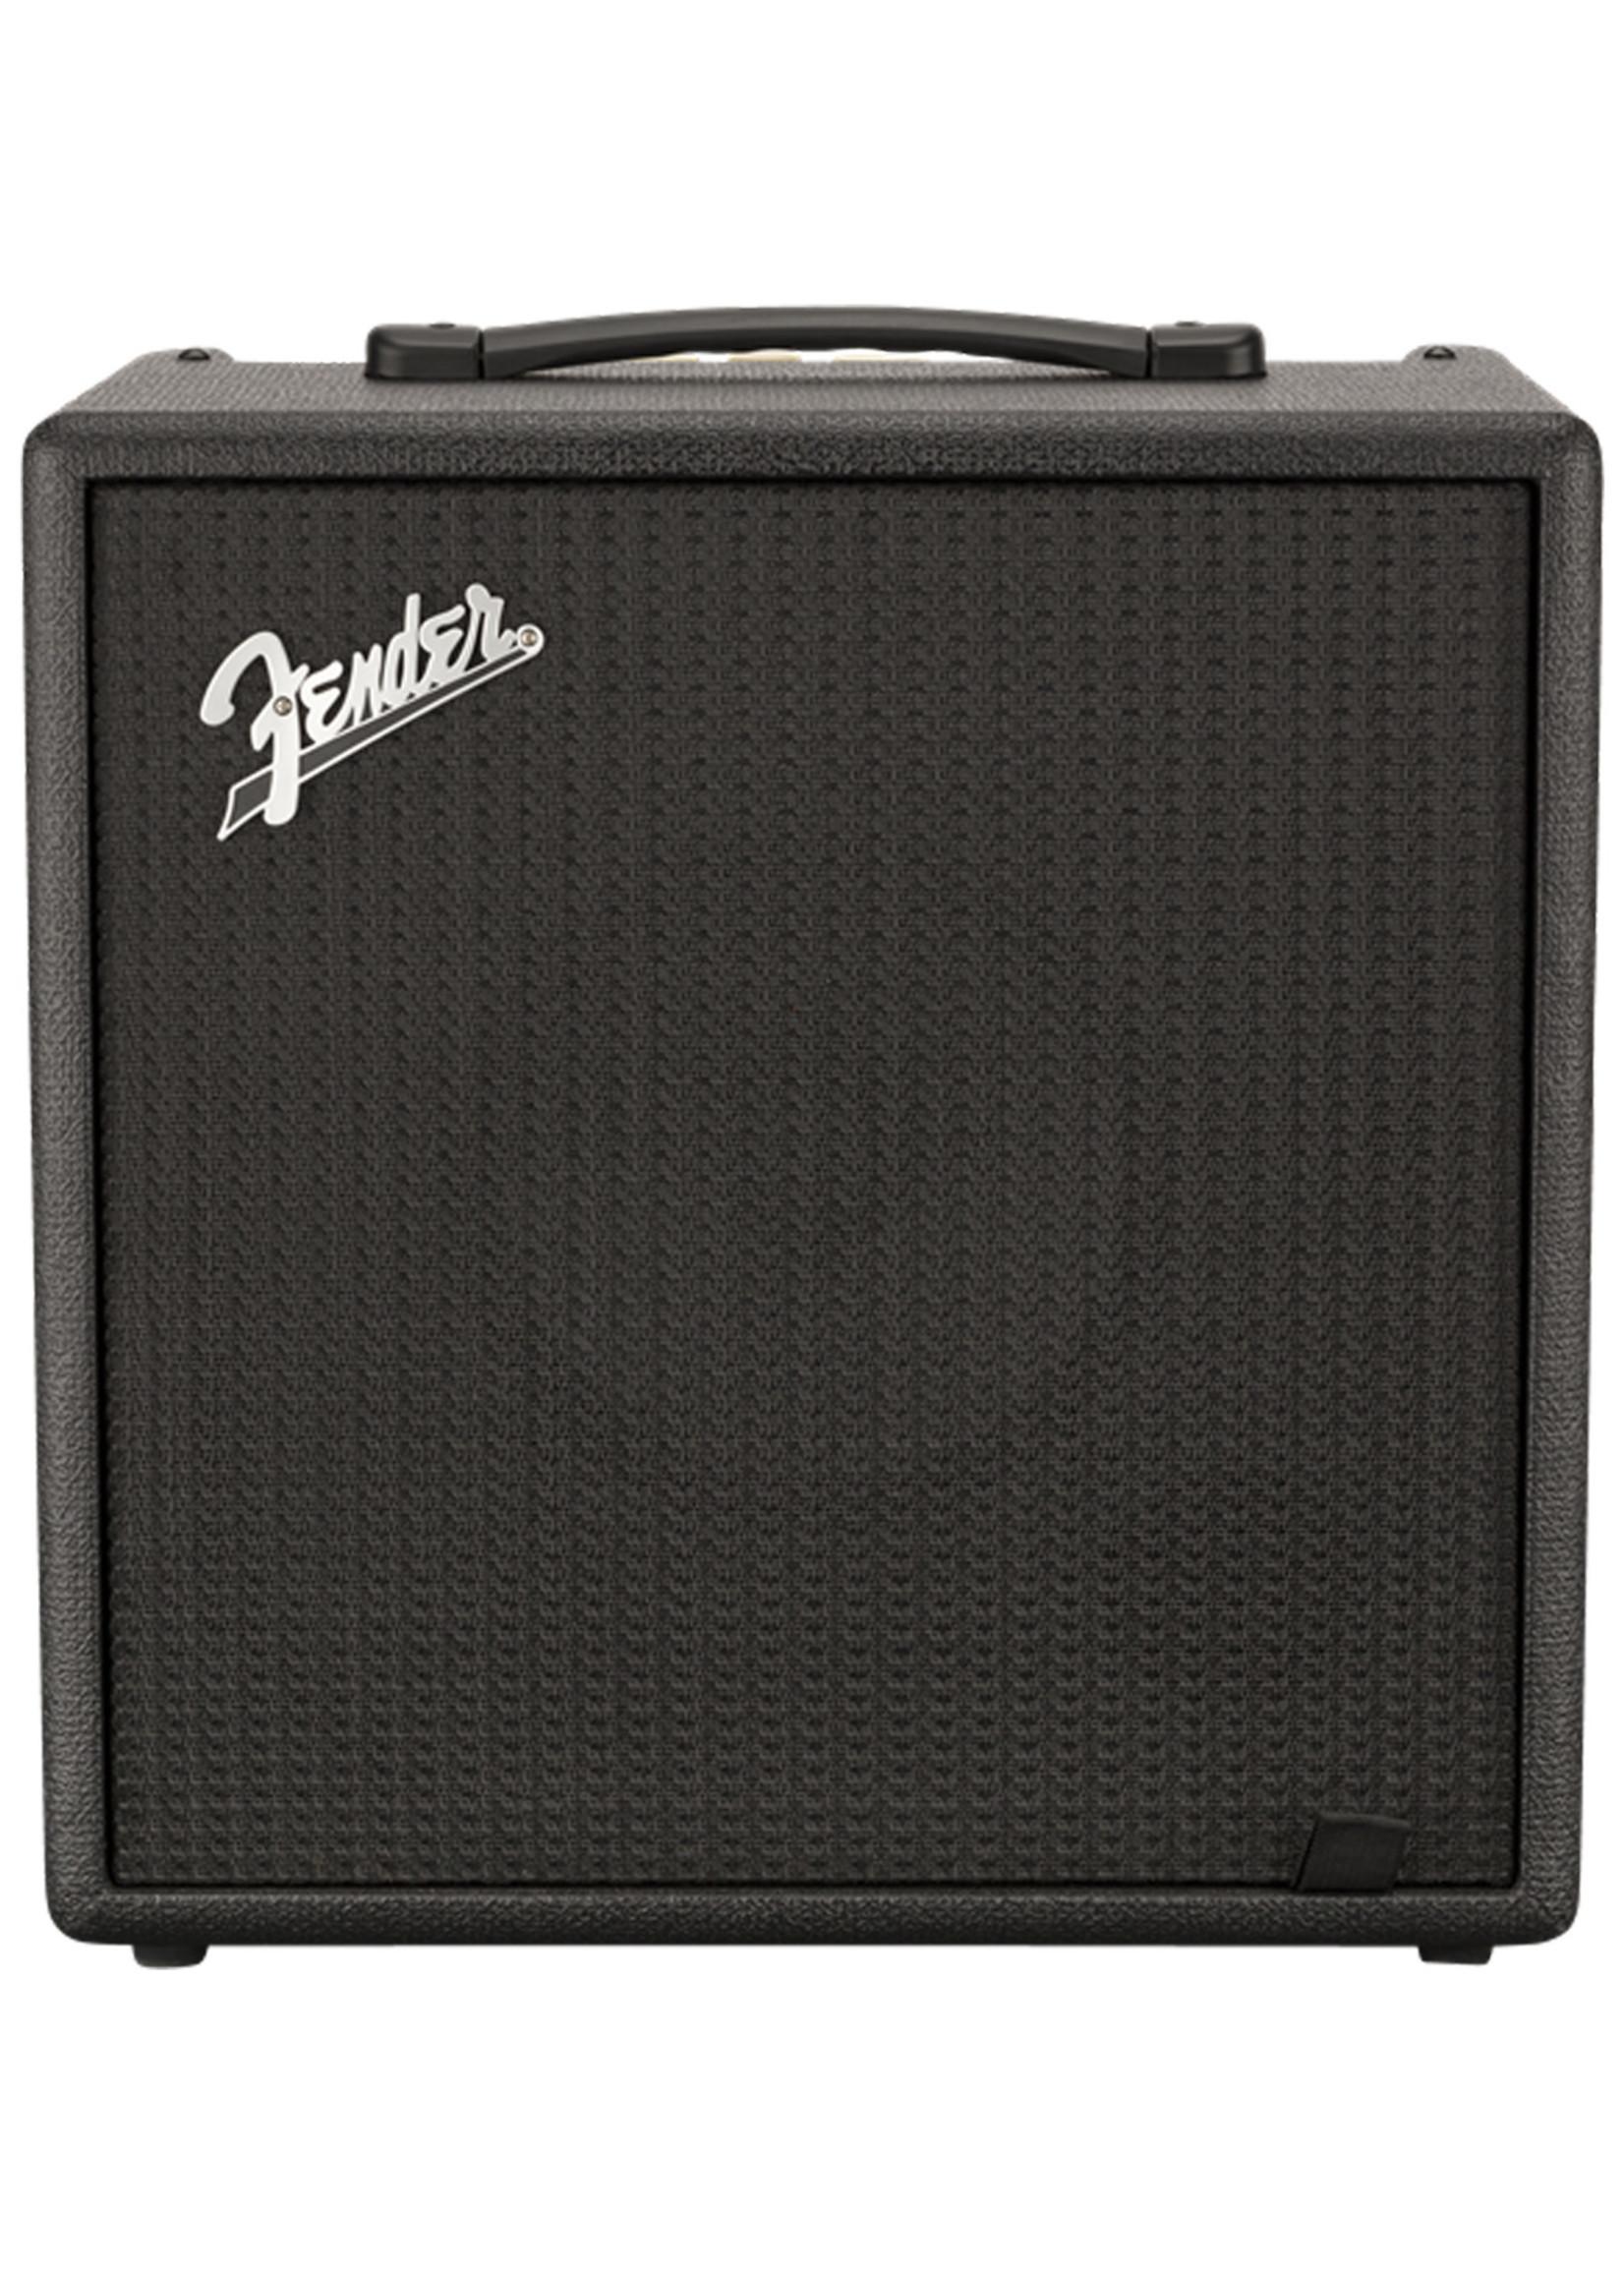 Fender Fender Rumble LT25